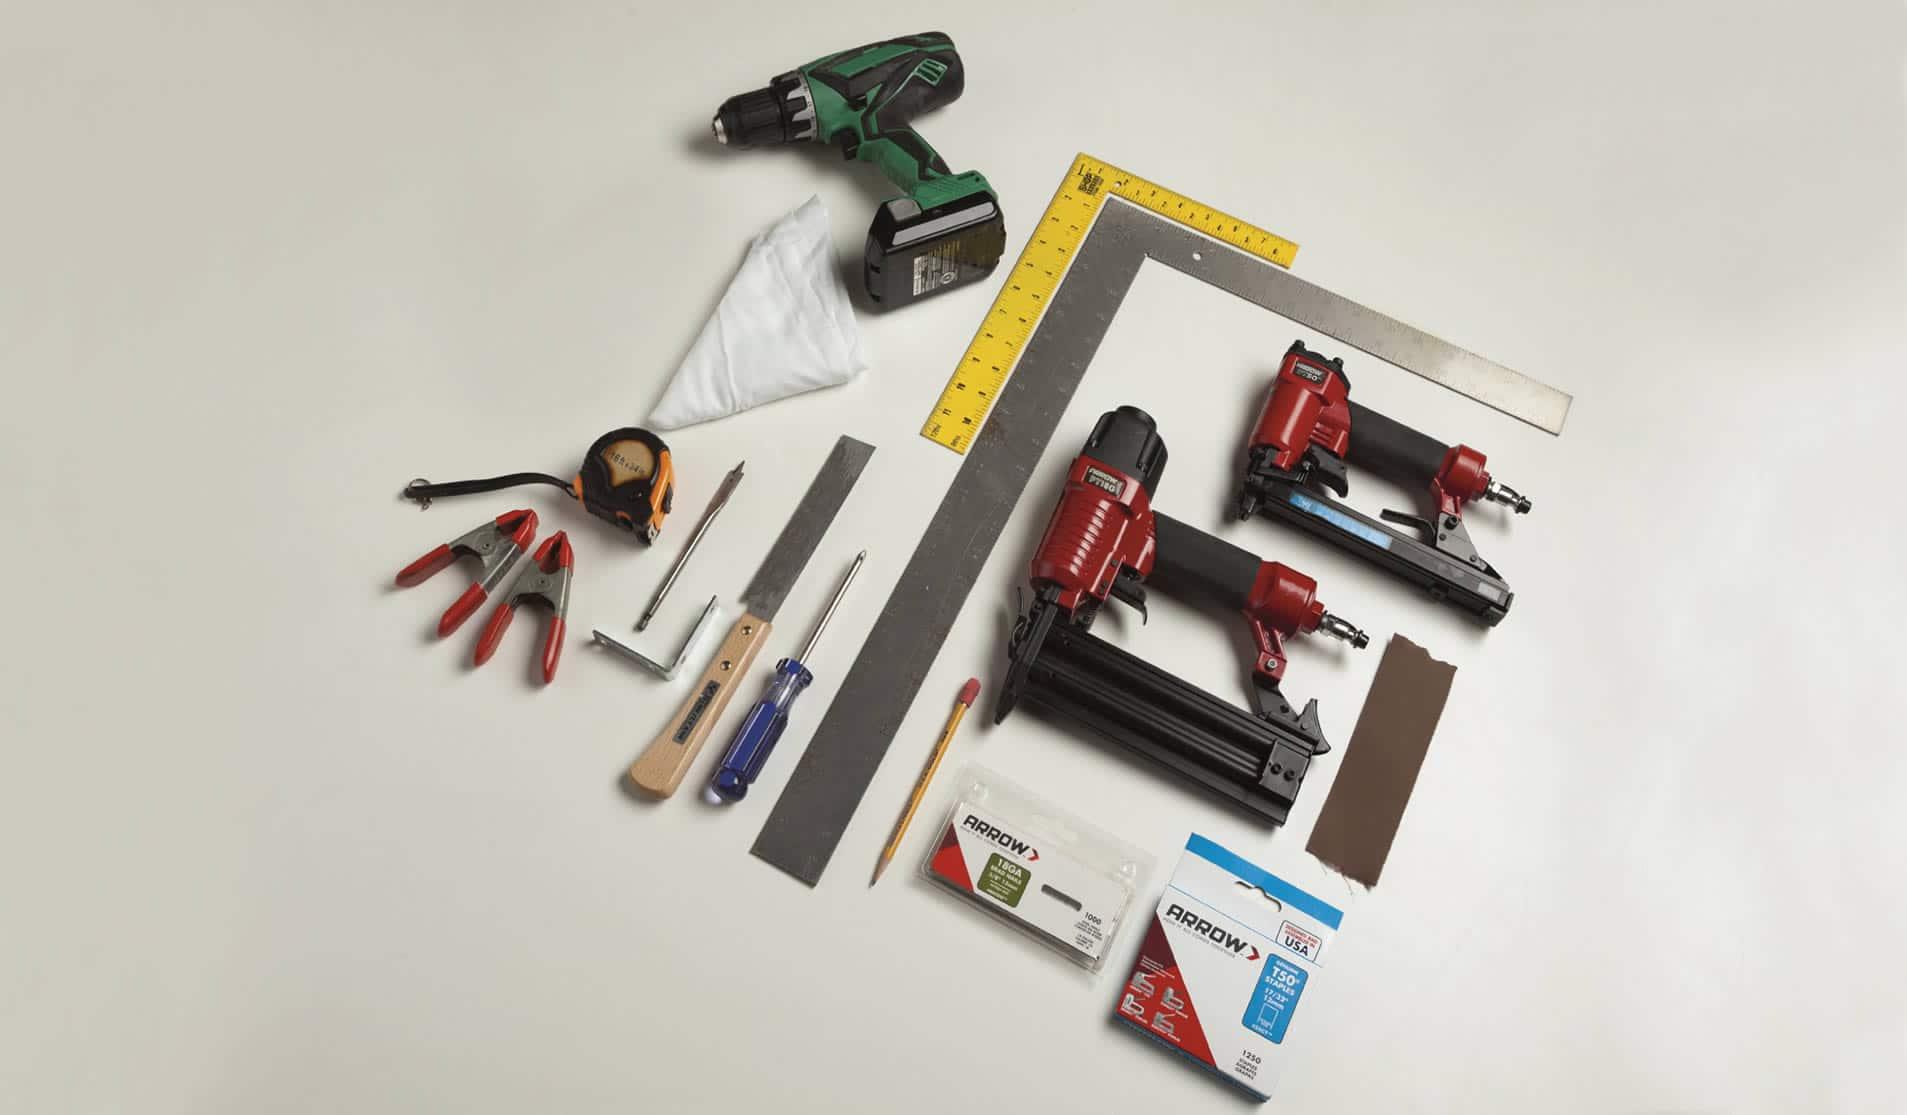 tool-organizer-arrow-project-tools-a.jpg